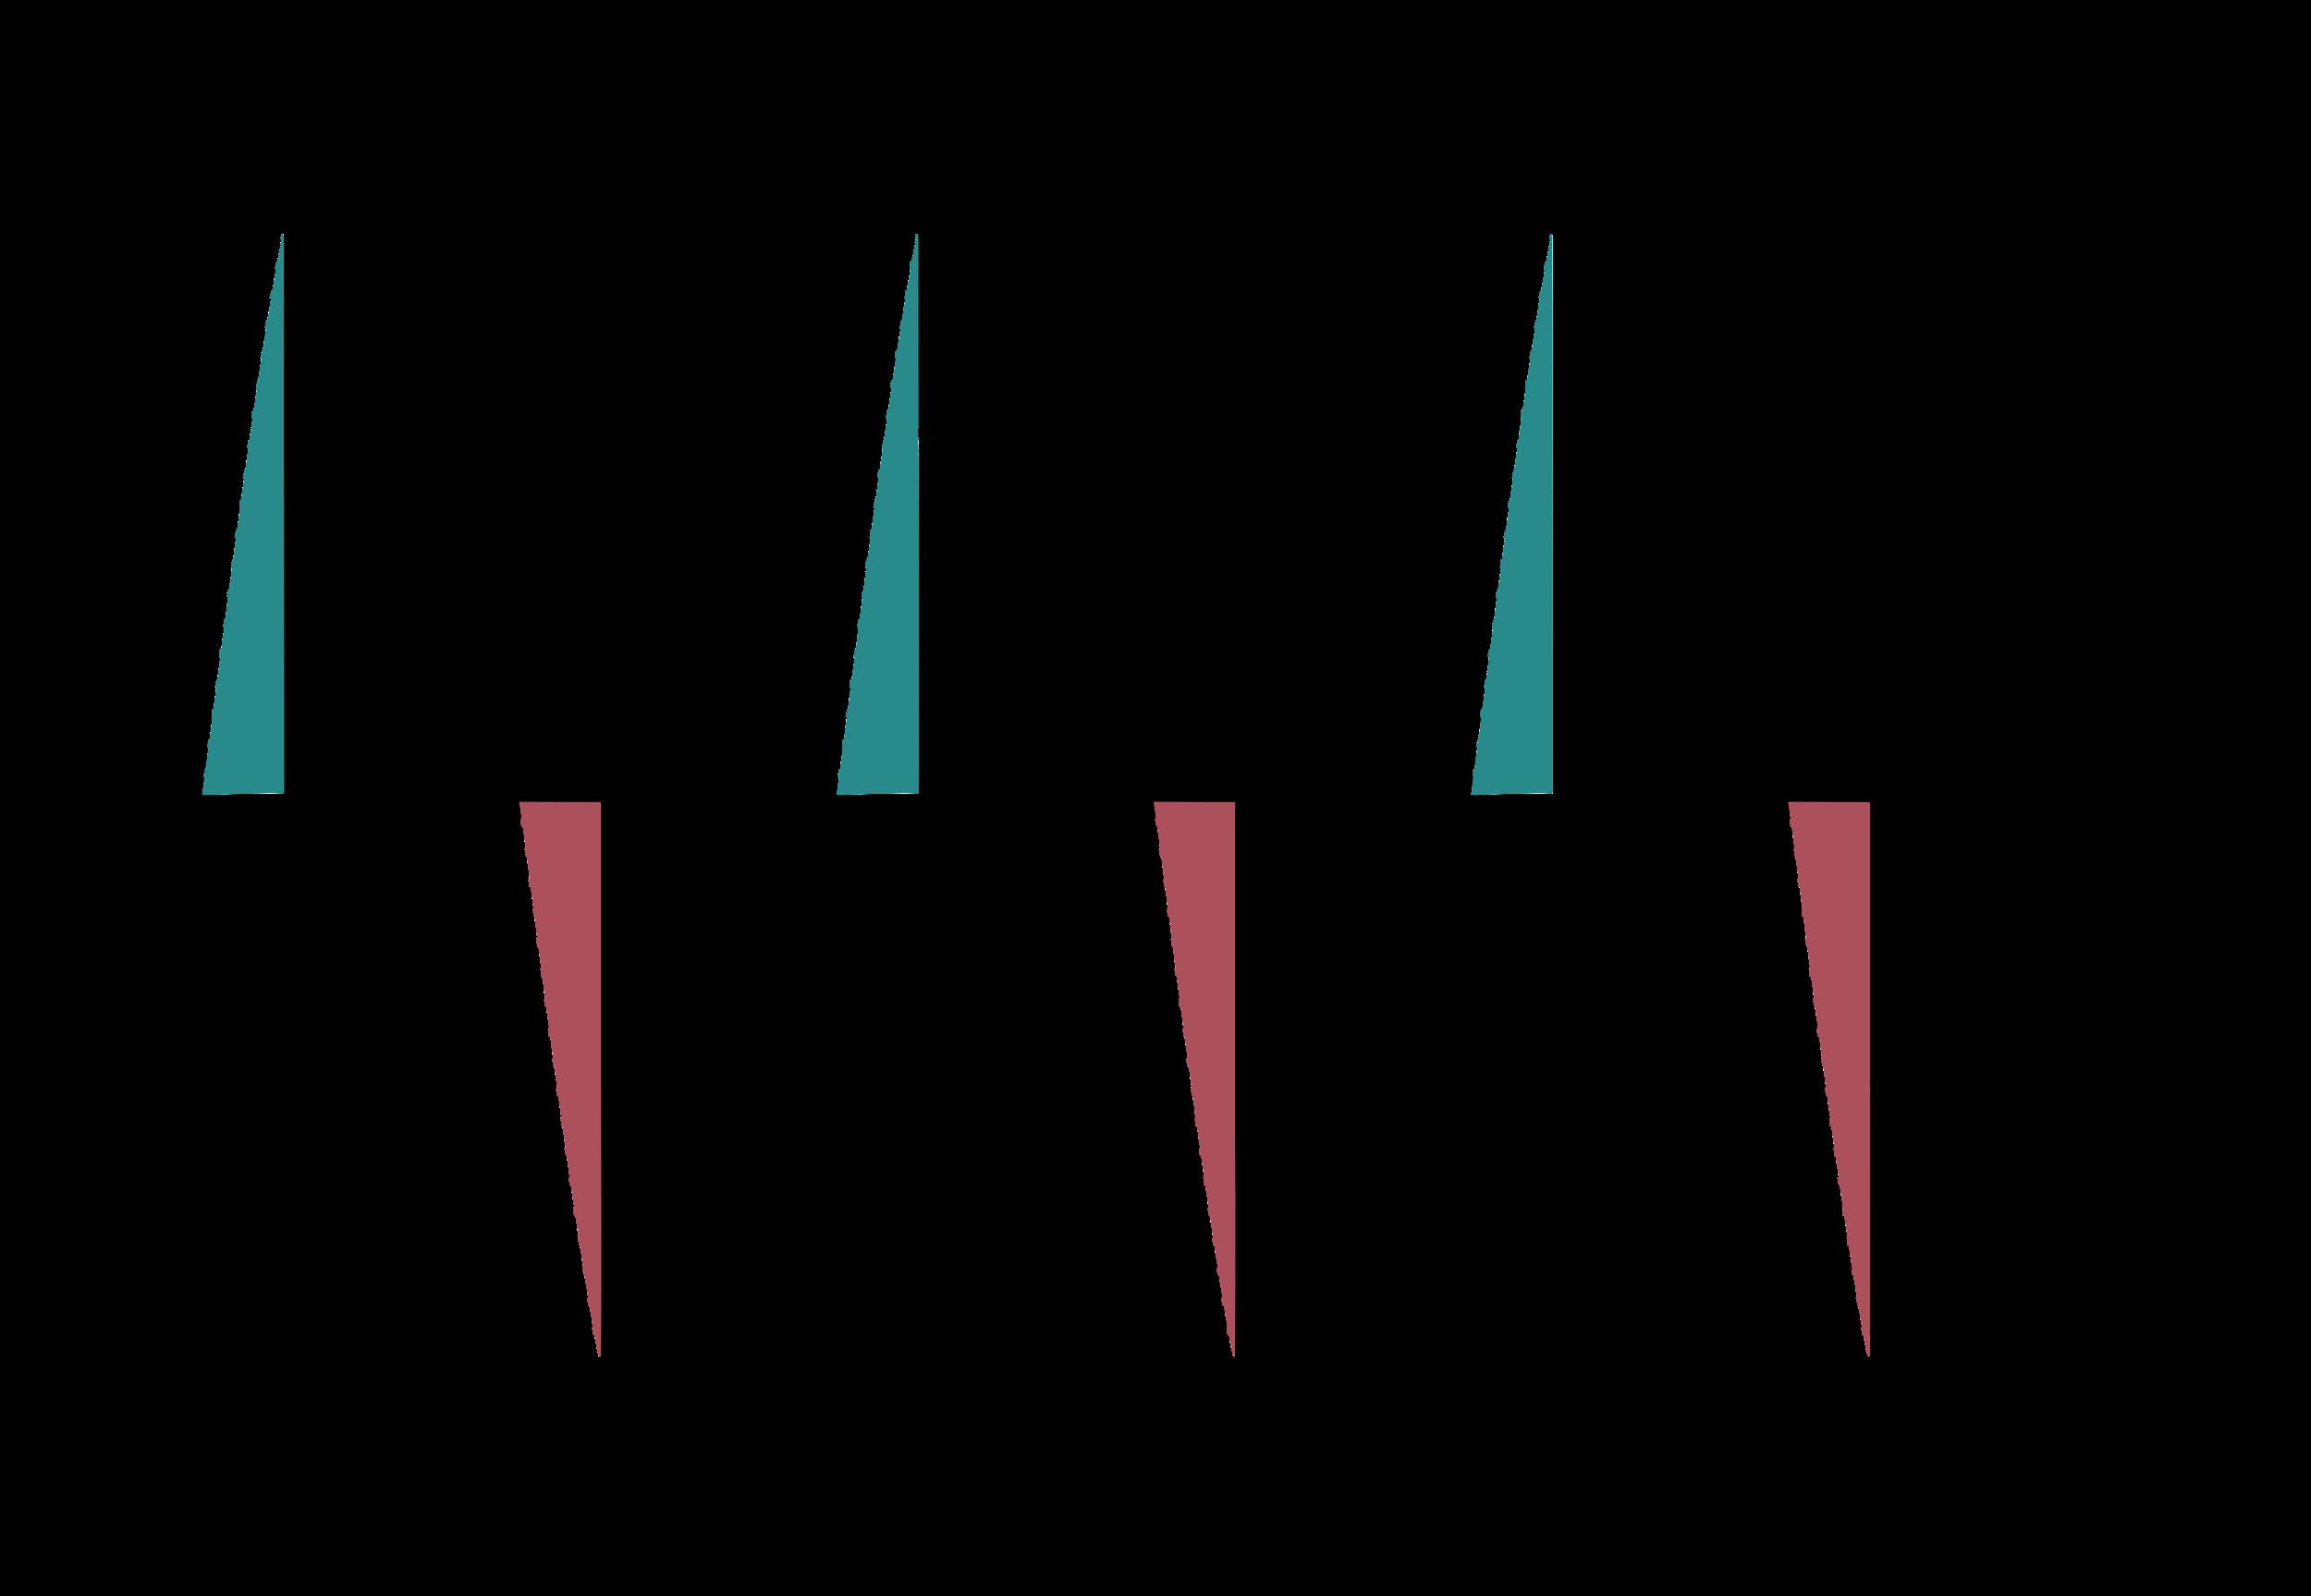 Phase angle control waveform